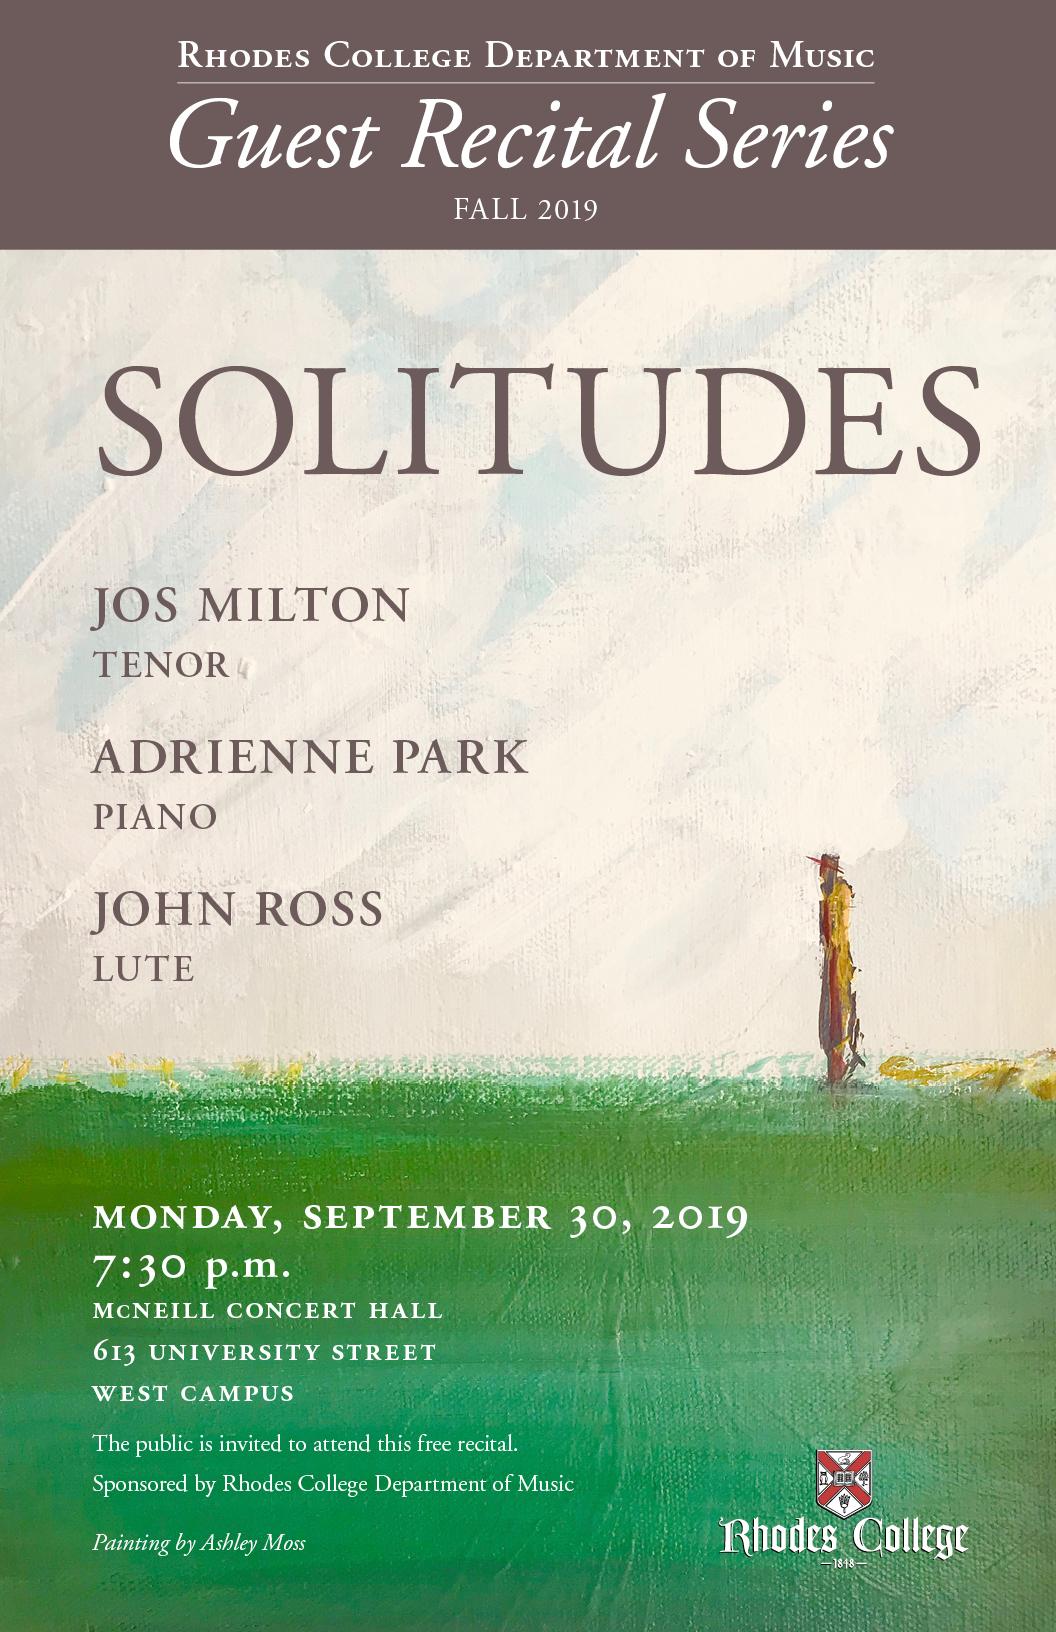 9.30.19_Guest Recital Series_Jos Milton.jpg